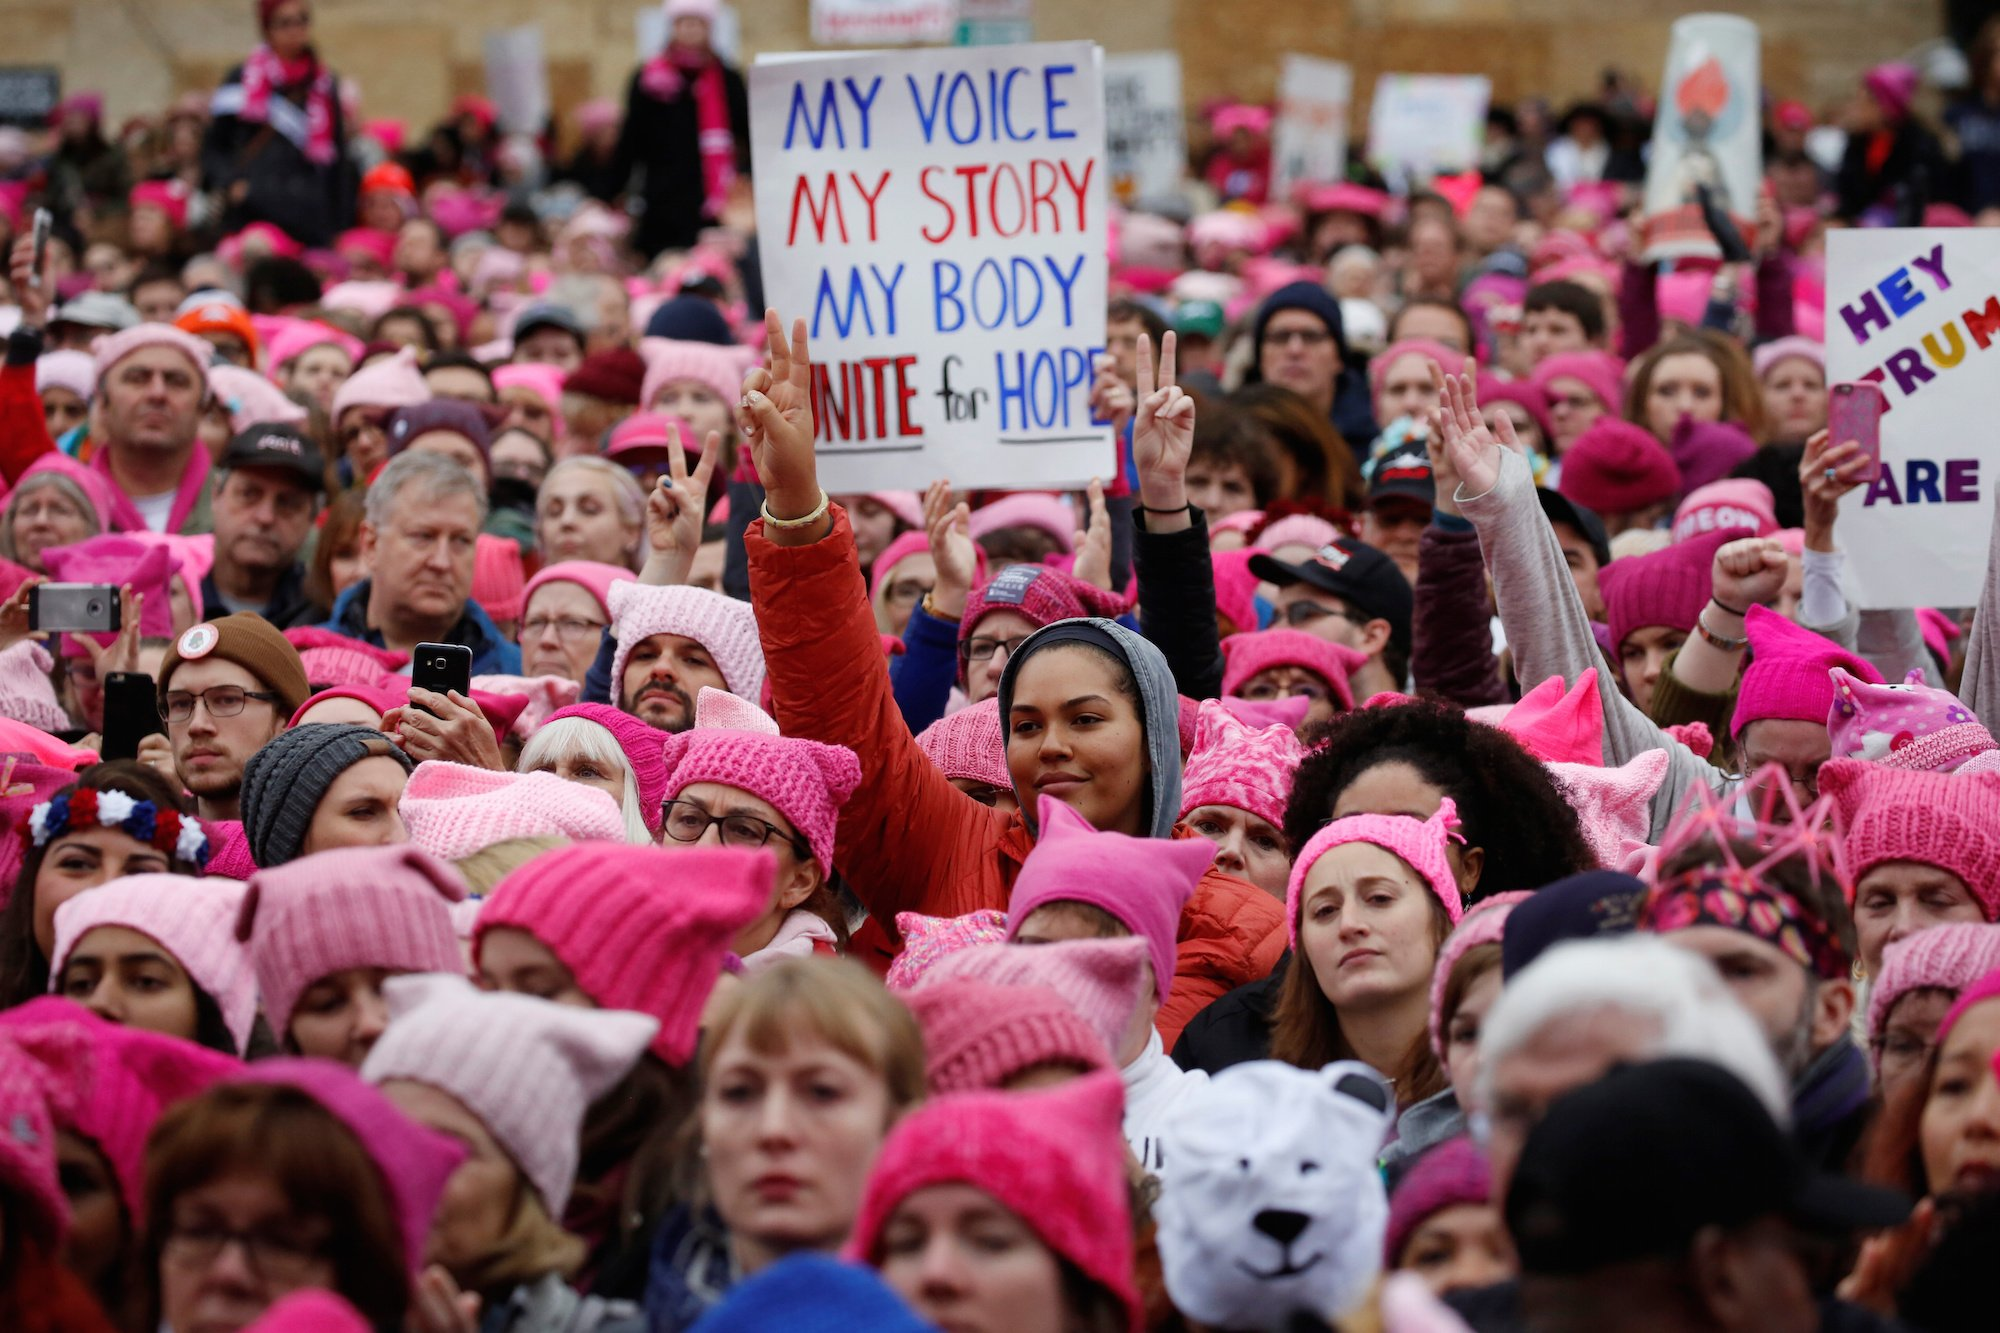 Women's March crowd wearing pink hats